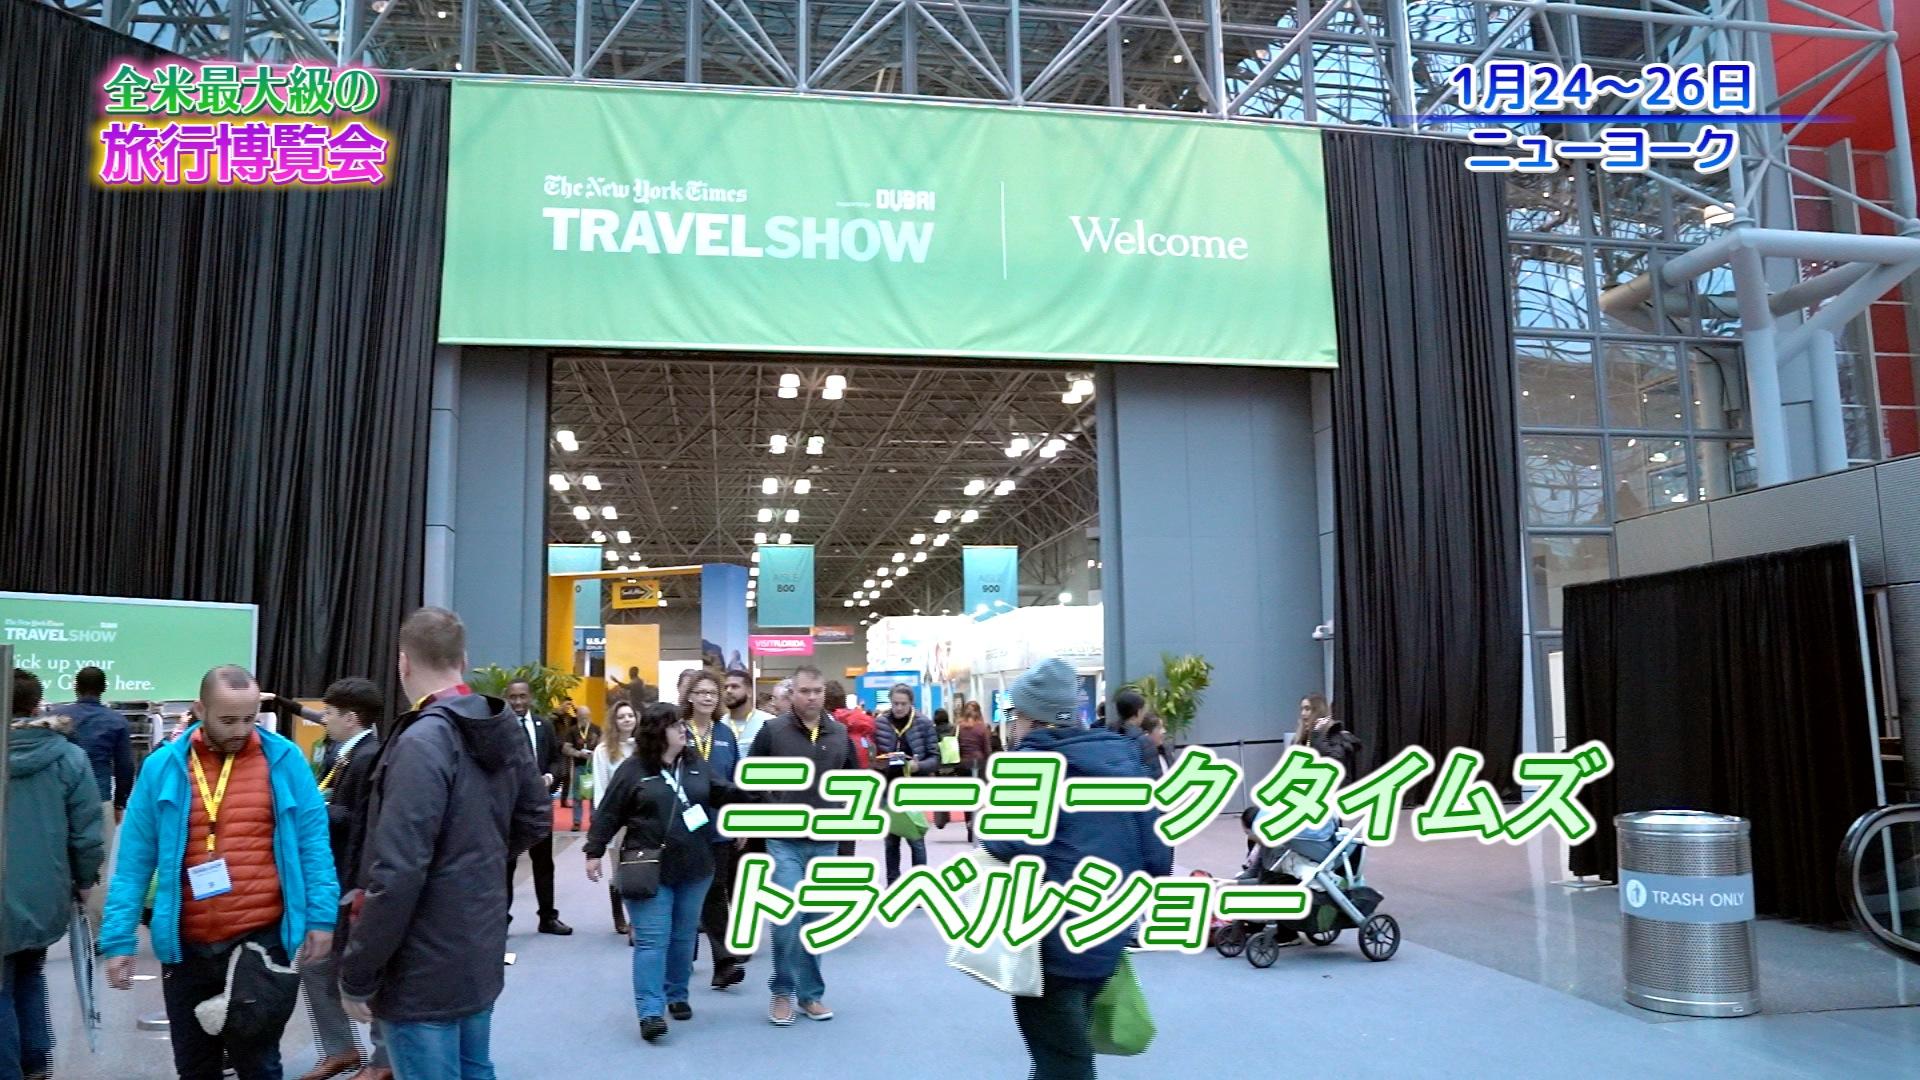 Image: アメリカ最大級の旅行博覧会 ニューヨークタイムズ・トラベルショー